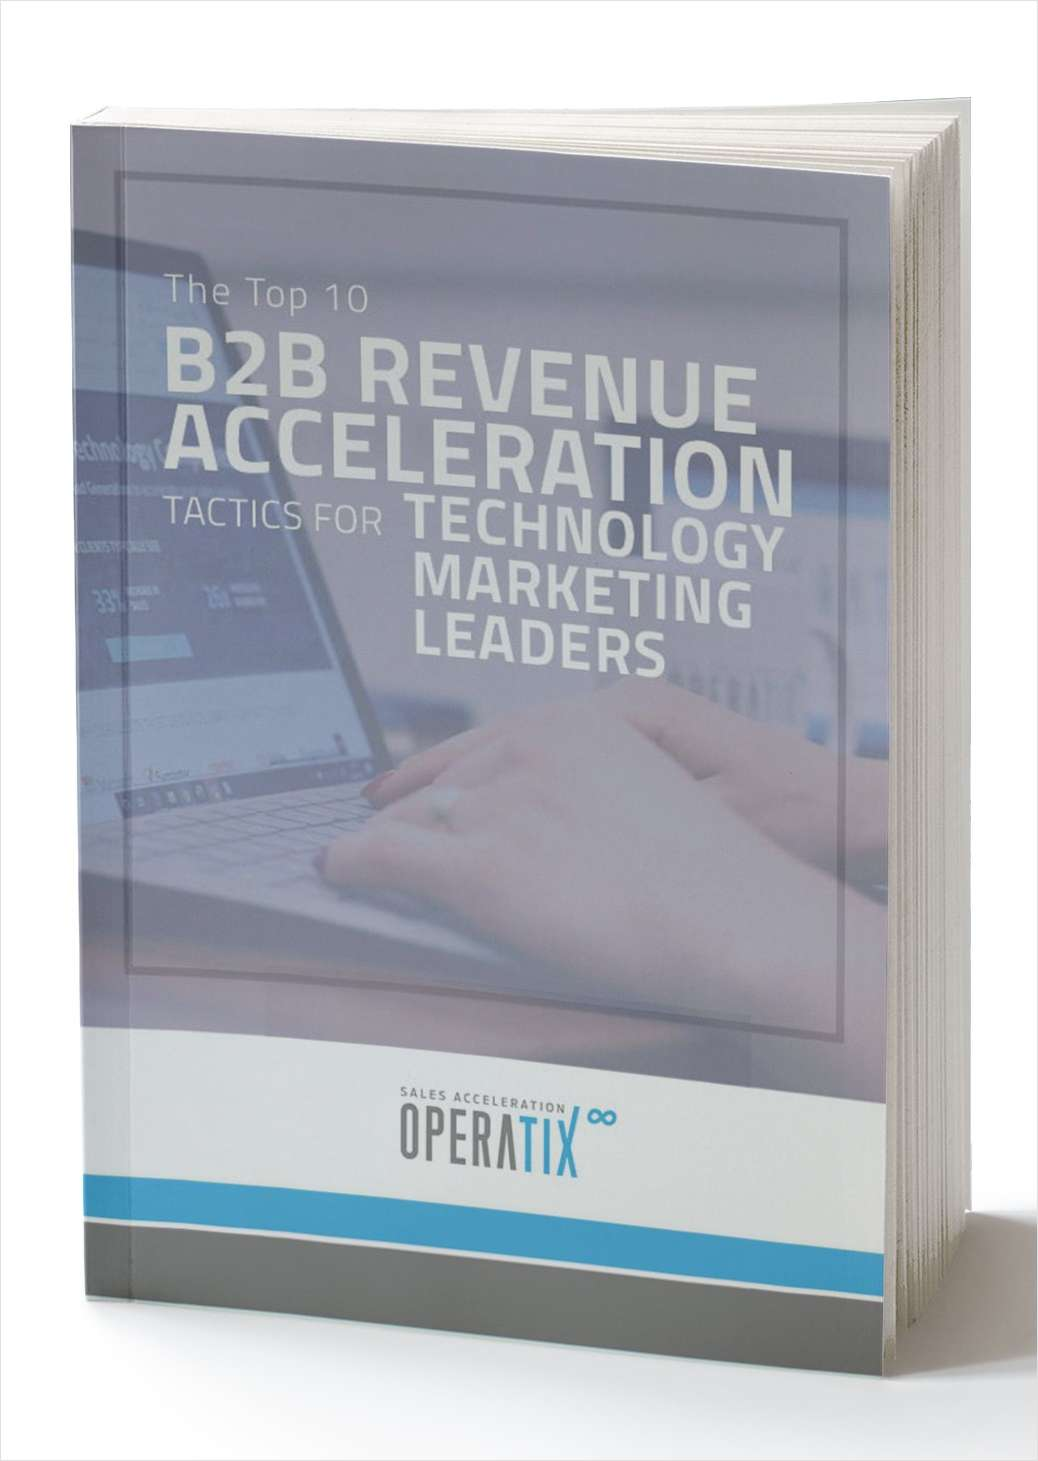 B2B Revenue Acceleration Tactics for Technology Marketing Leaders